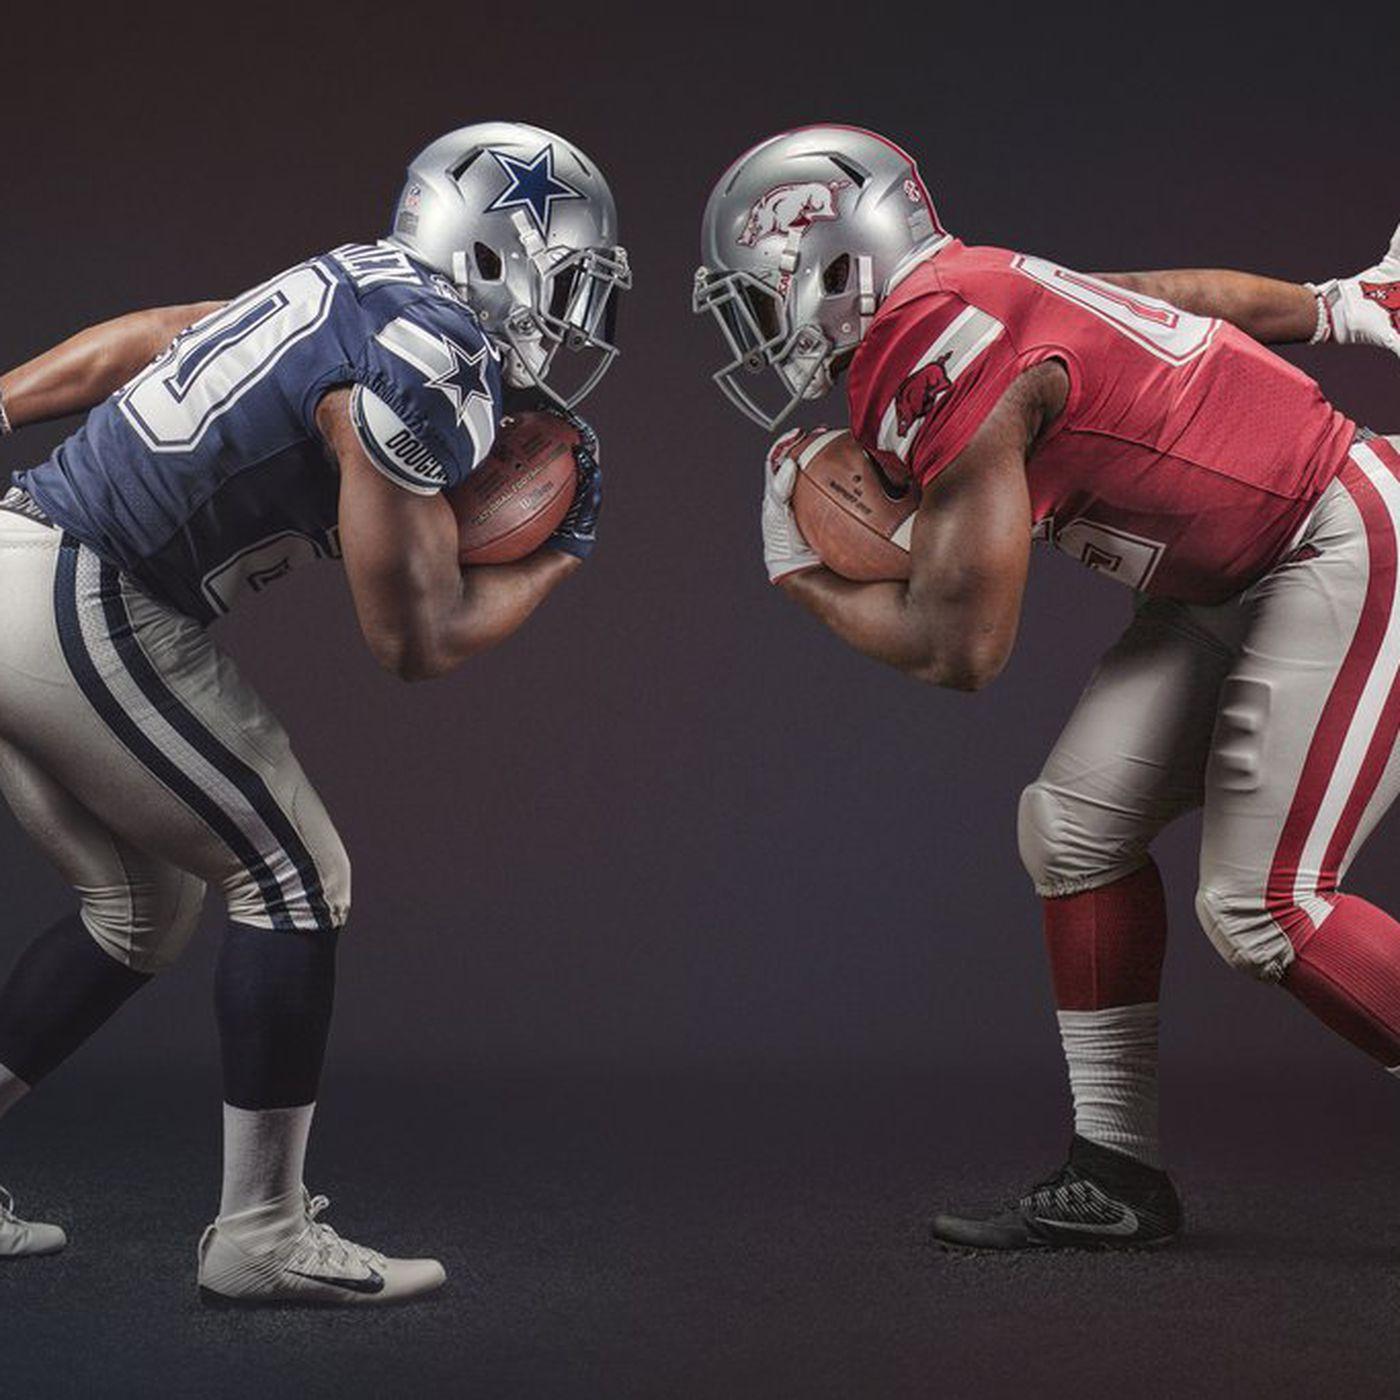 promo code 6bc35 53b09 Why Arkansas is wearing 'Dallas Cowboys' uniforms vs. Texas ...